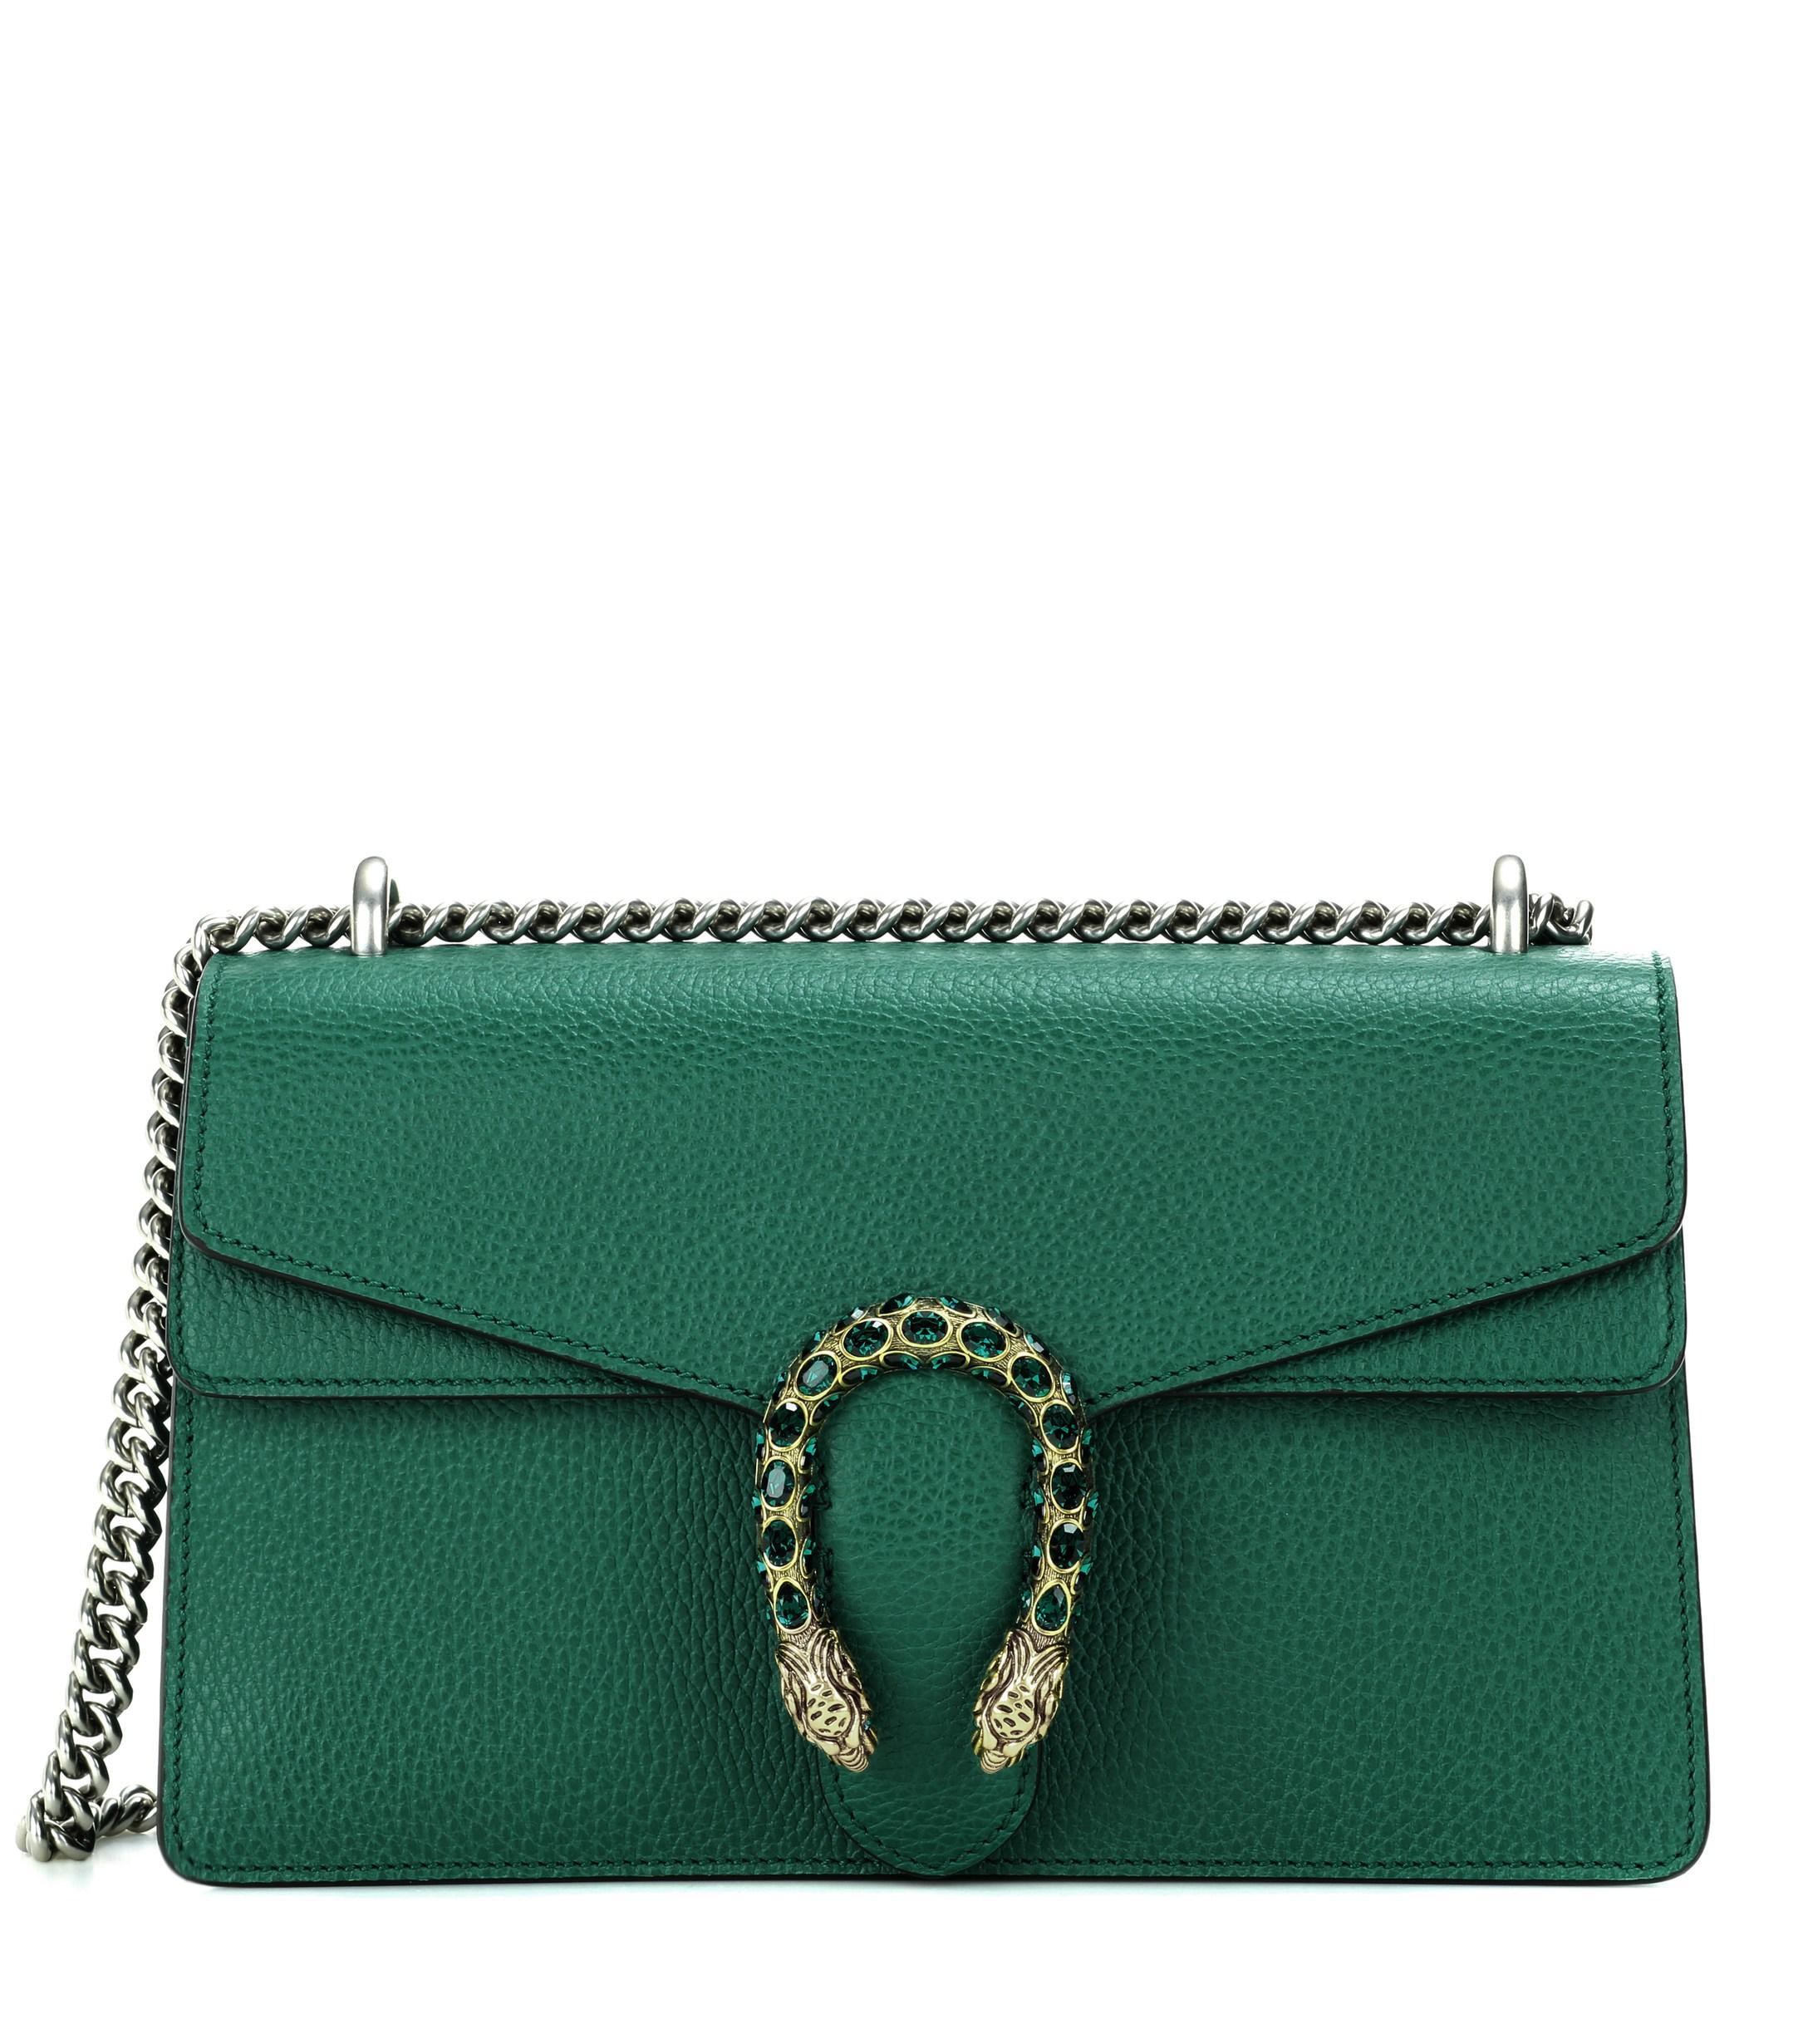 73c095af71d0 Gucci Dionysus Small Leather Shoulder Bag in Green - Save 10% - Lyst